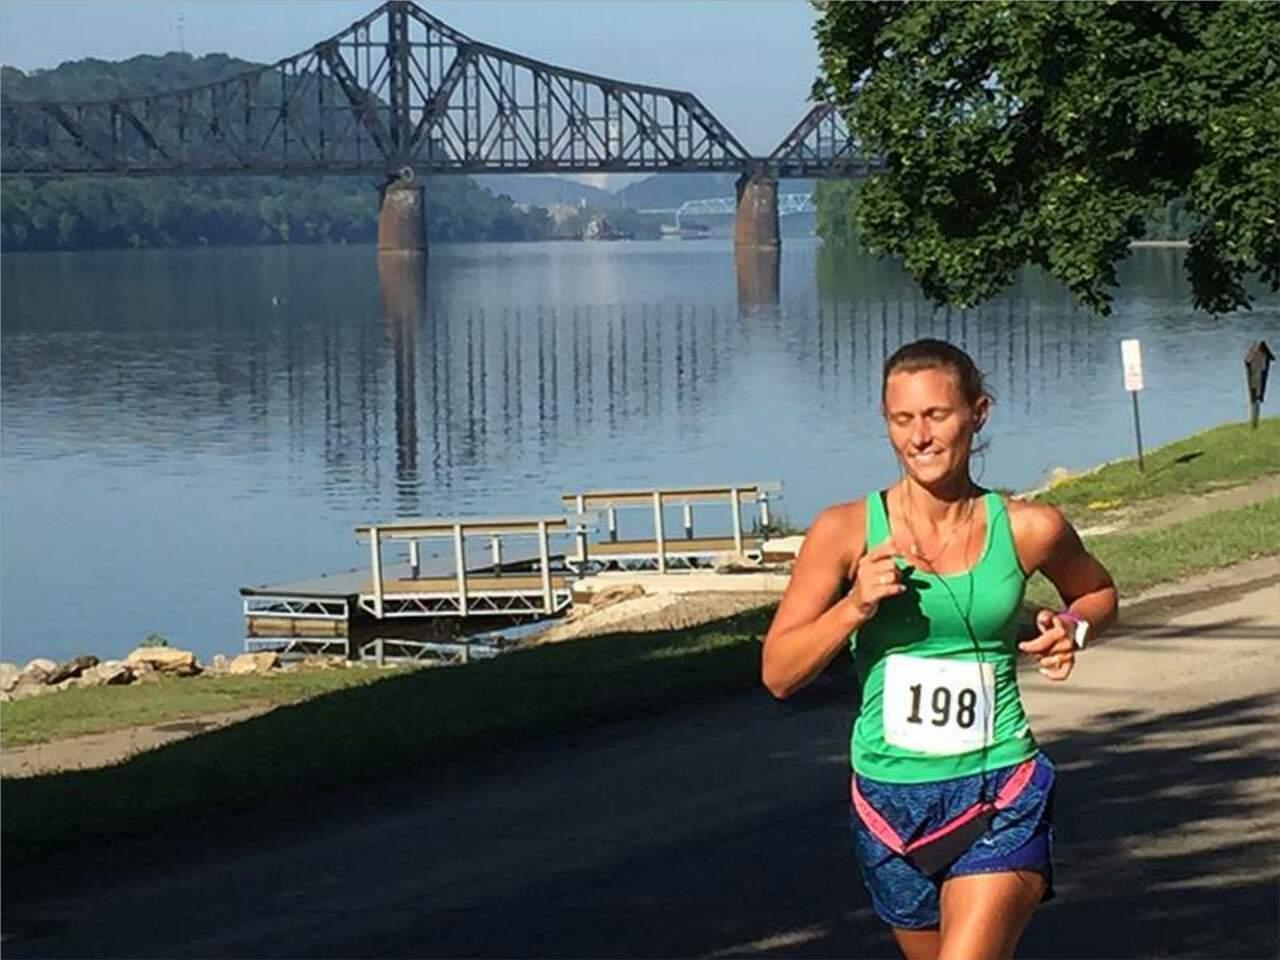 Ohio River Trail Council River Run 5K & 10 K Road Race Series - Spring, Summer, & Fall